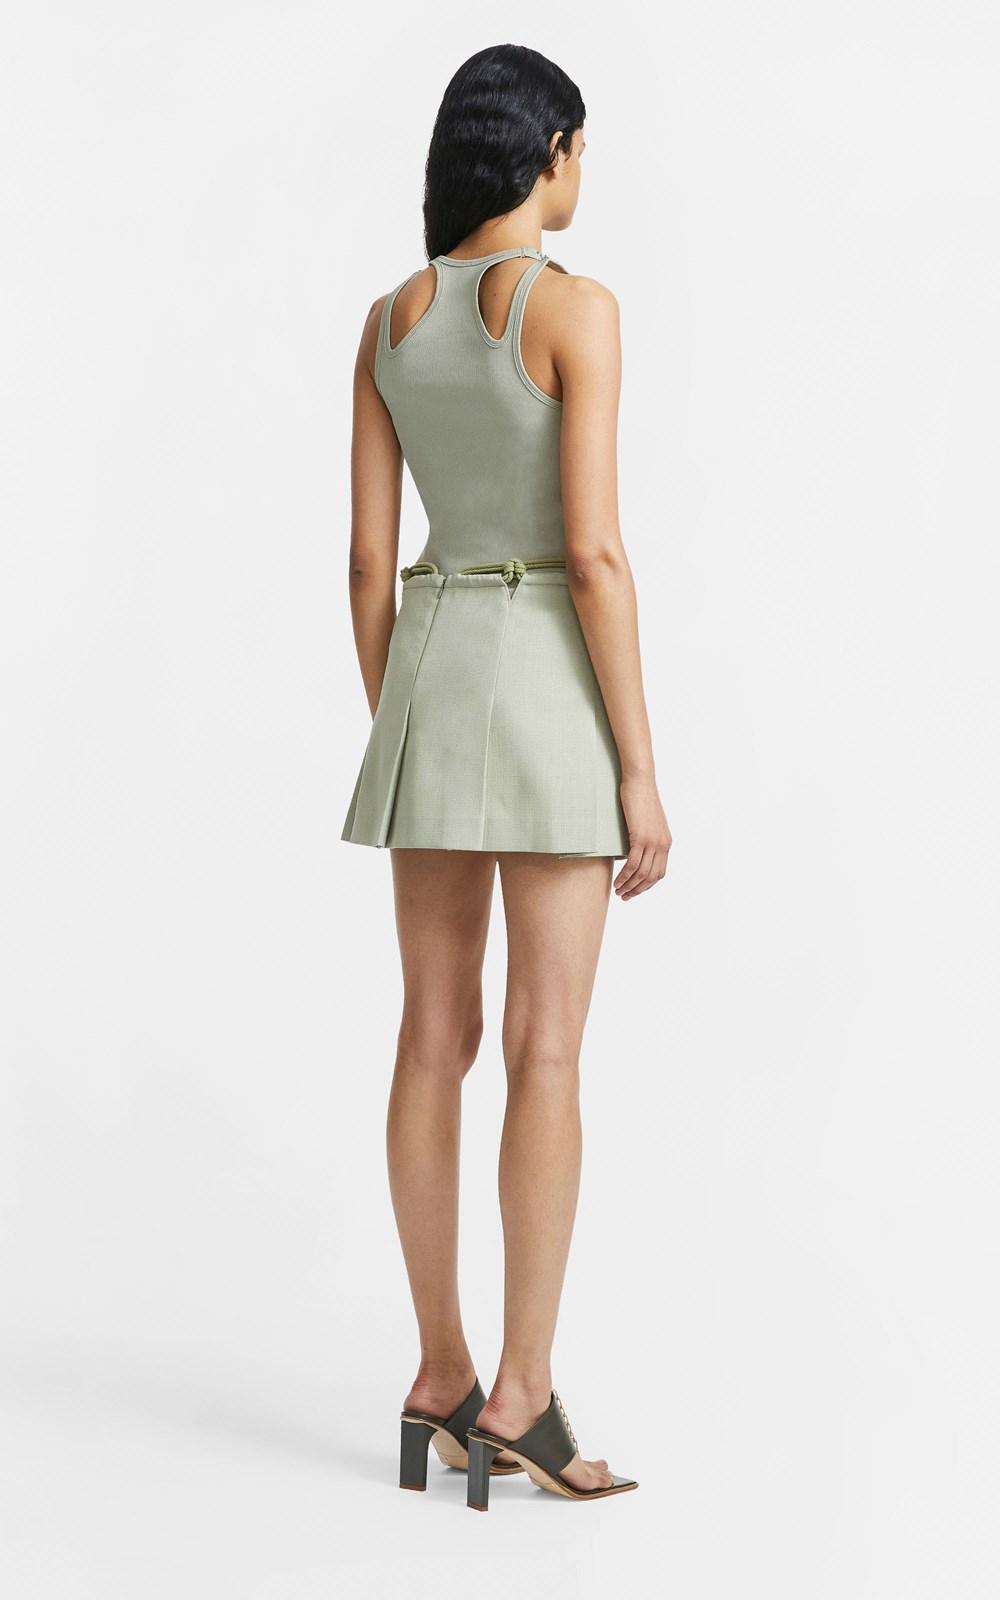 Skirts | MACRAME MINI SKIRT